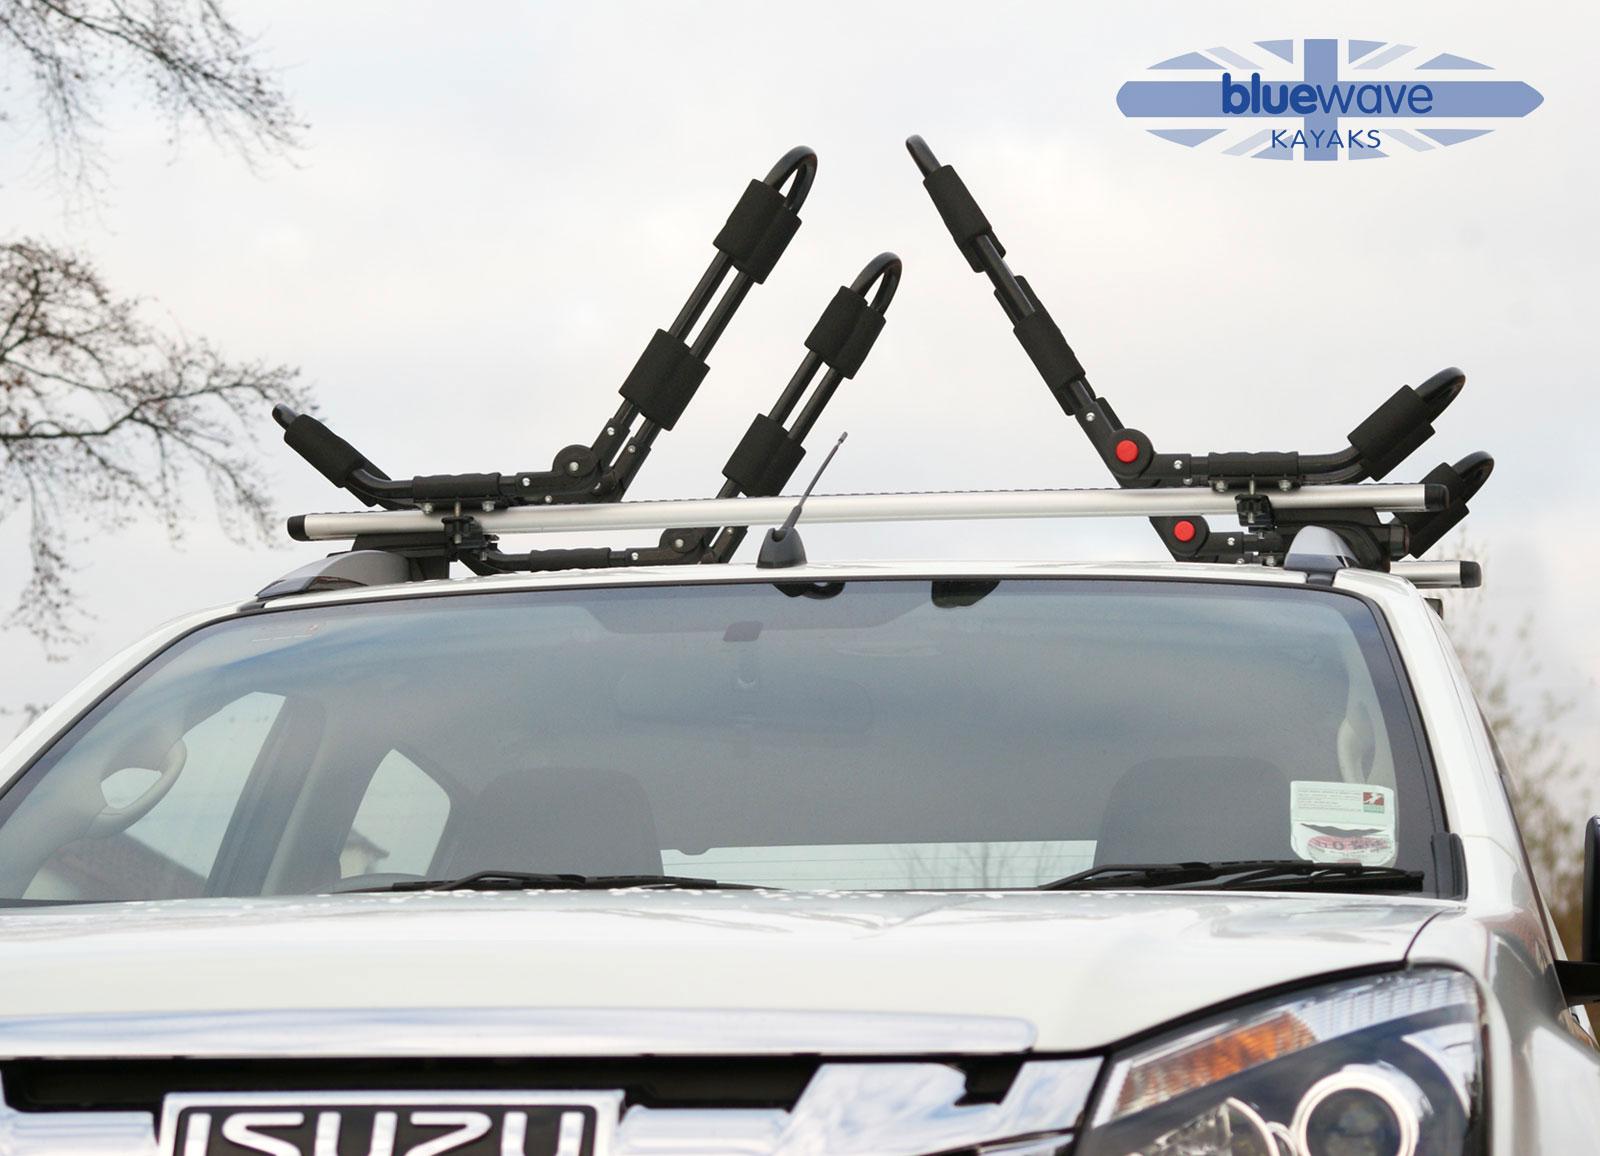 Honda Accord Roof Racks Honda Crv Roof Rack In Racks Ebay Electronics Cars .html | Autos Post